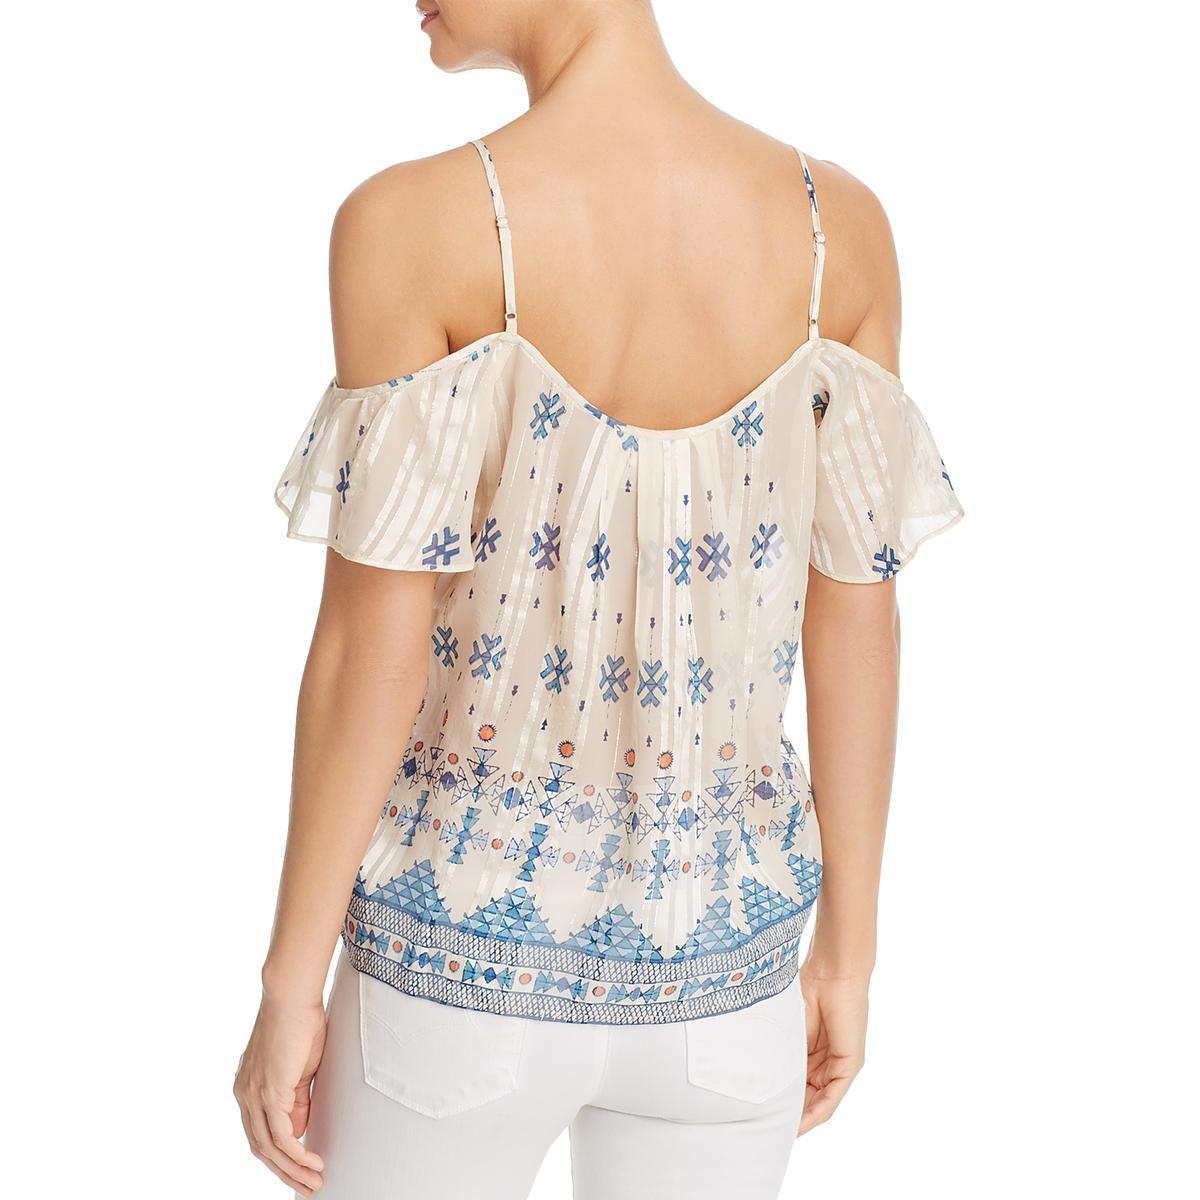 d9d47cdc8b9beb Joie - Natural Womens Adorlee Cold Shoulder Sheer Blouse - Lyst. View  fullscreen